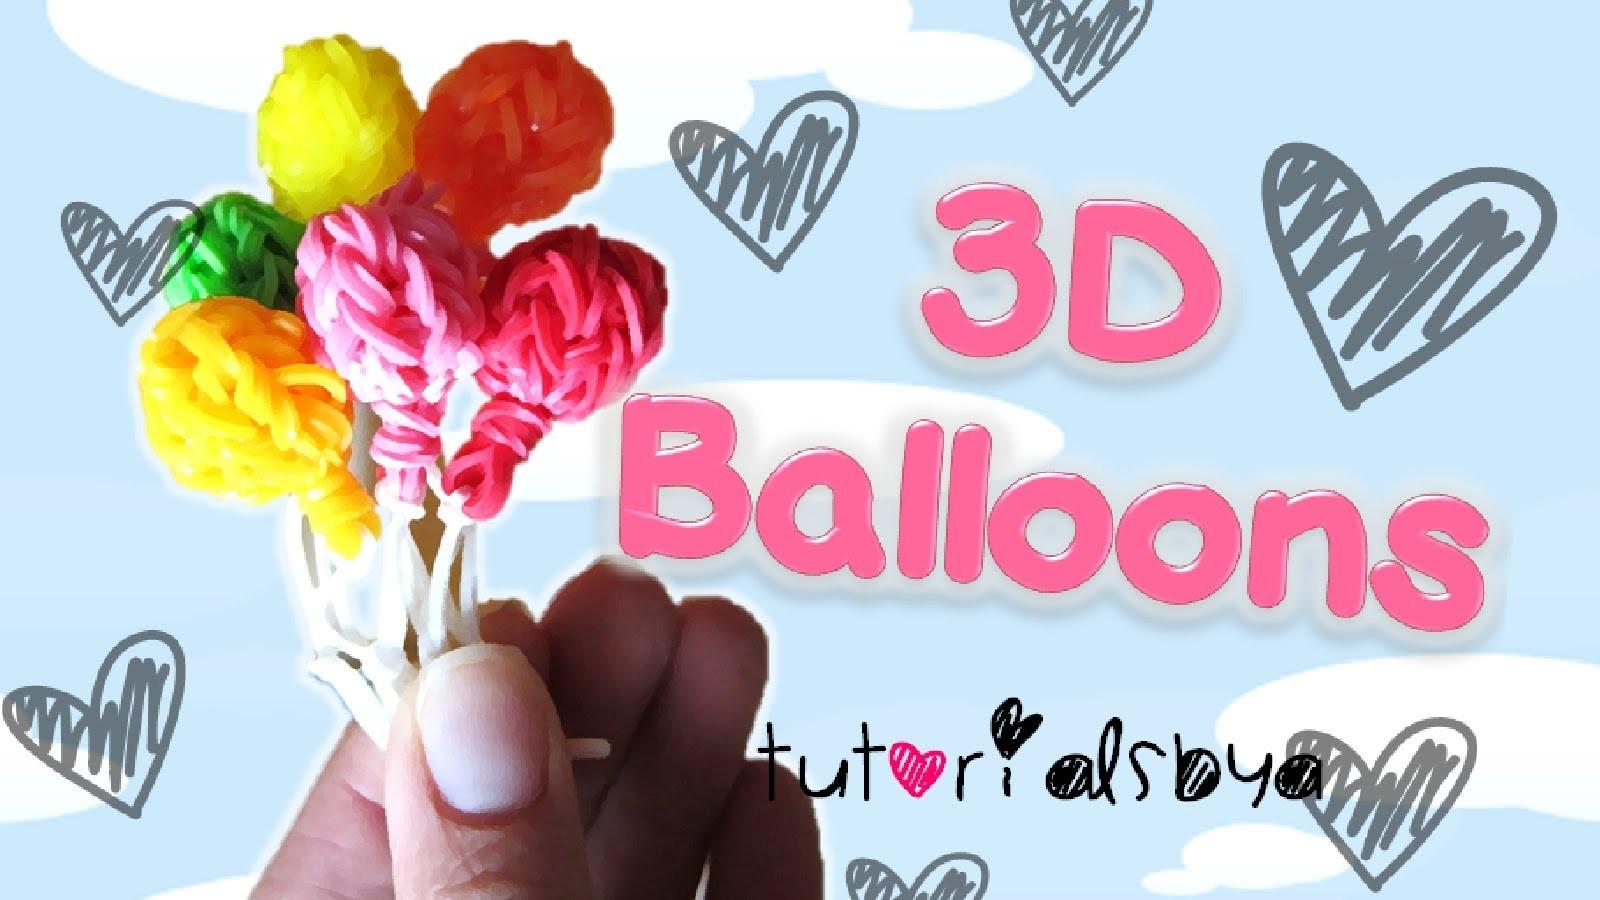 NEW 3D Balloon Charm. Mini Figurine Rainbow Loom Tutorial | How To